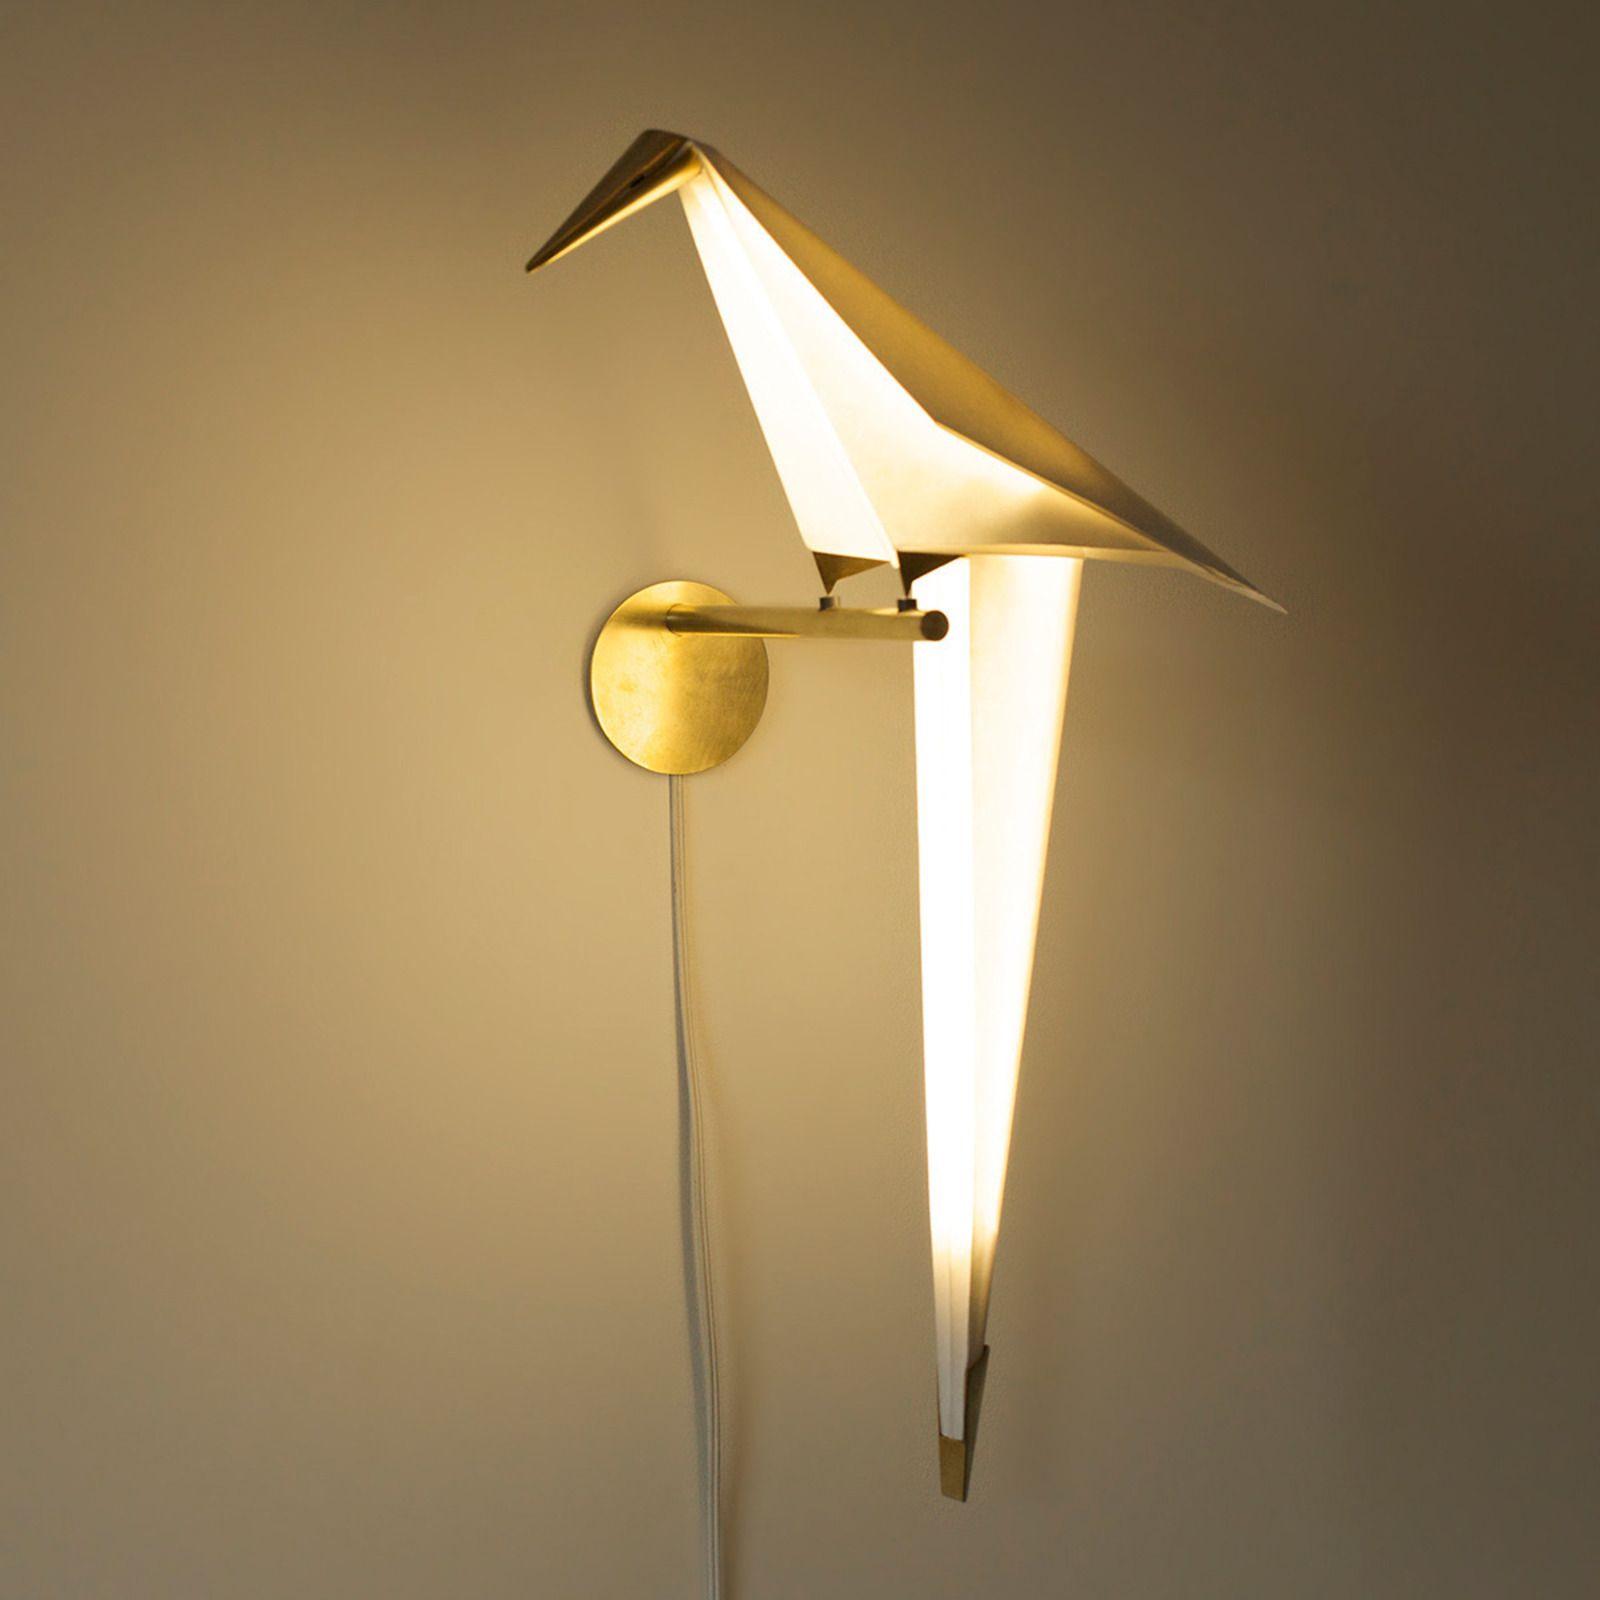 Umut Yamac perch light for Moooi | Deklarelijn Studio favorieten ...